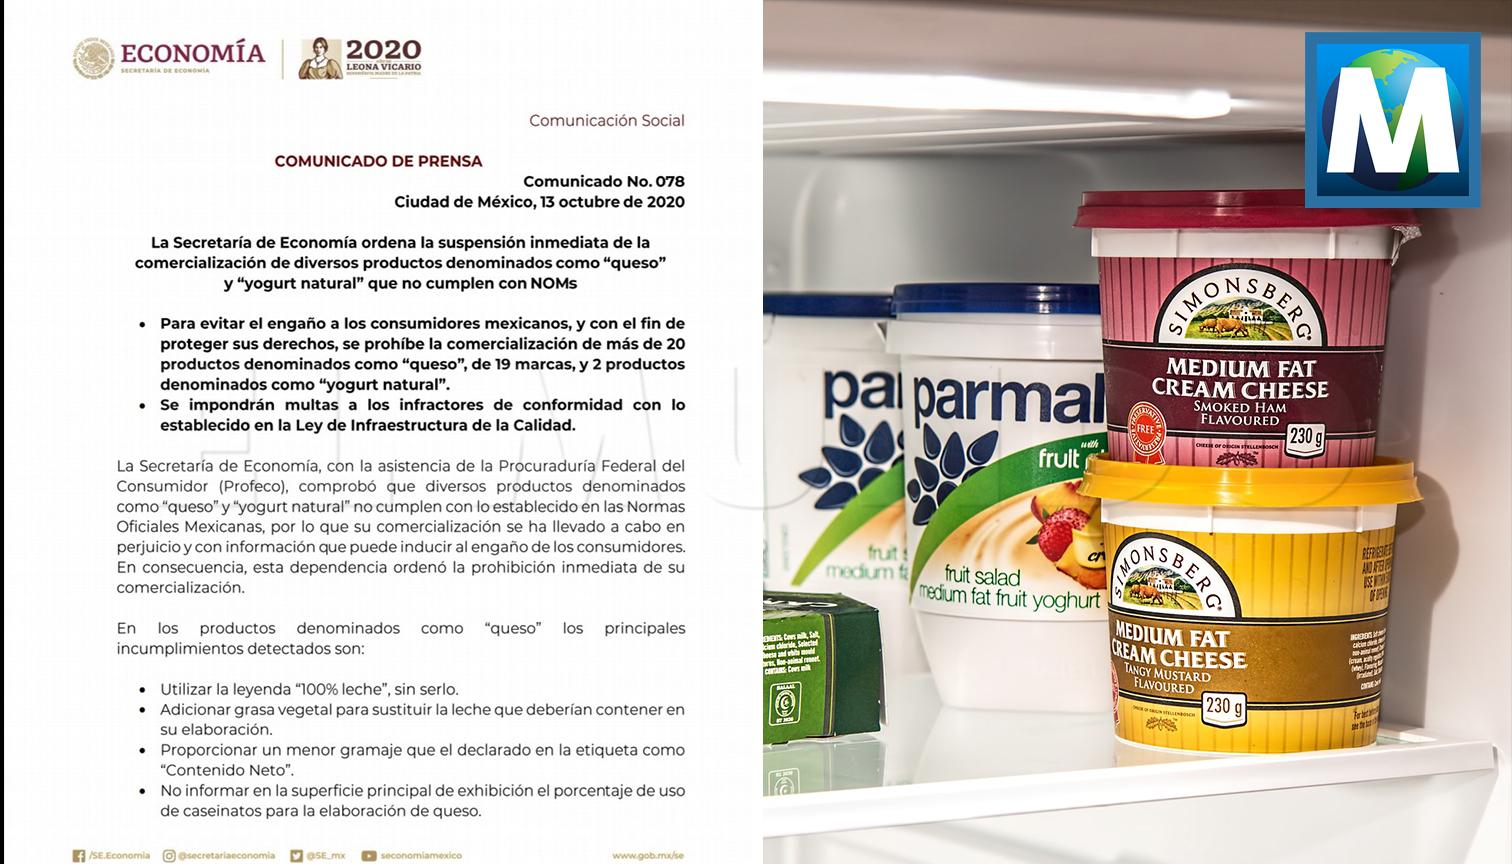 Prohíben a estas marcas vender quesos en México; incumplen las normas